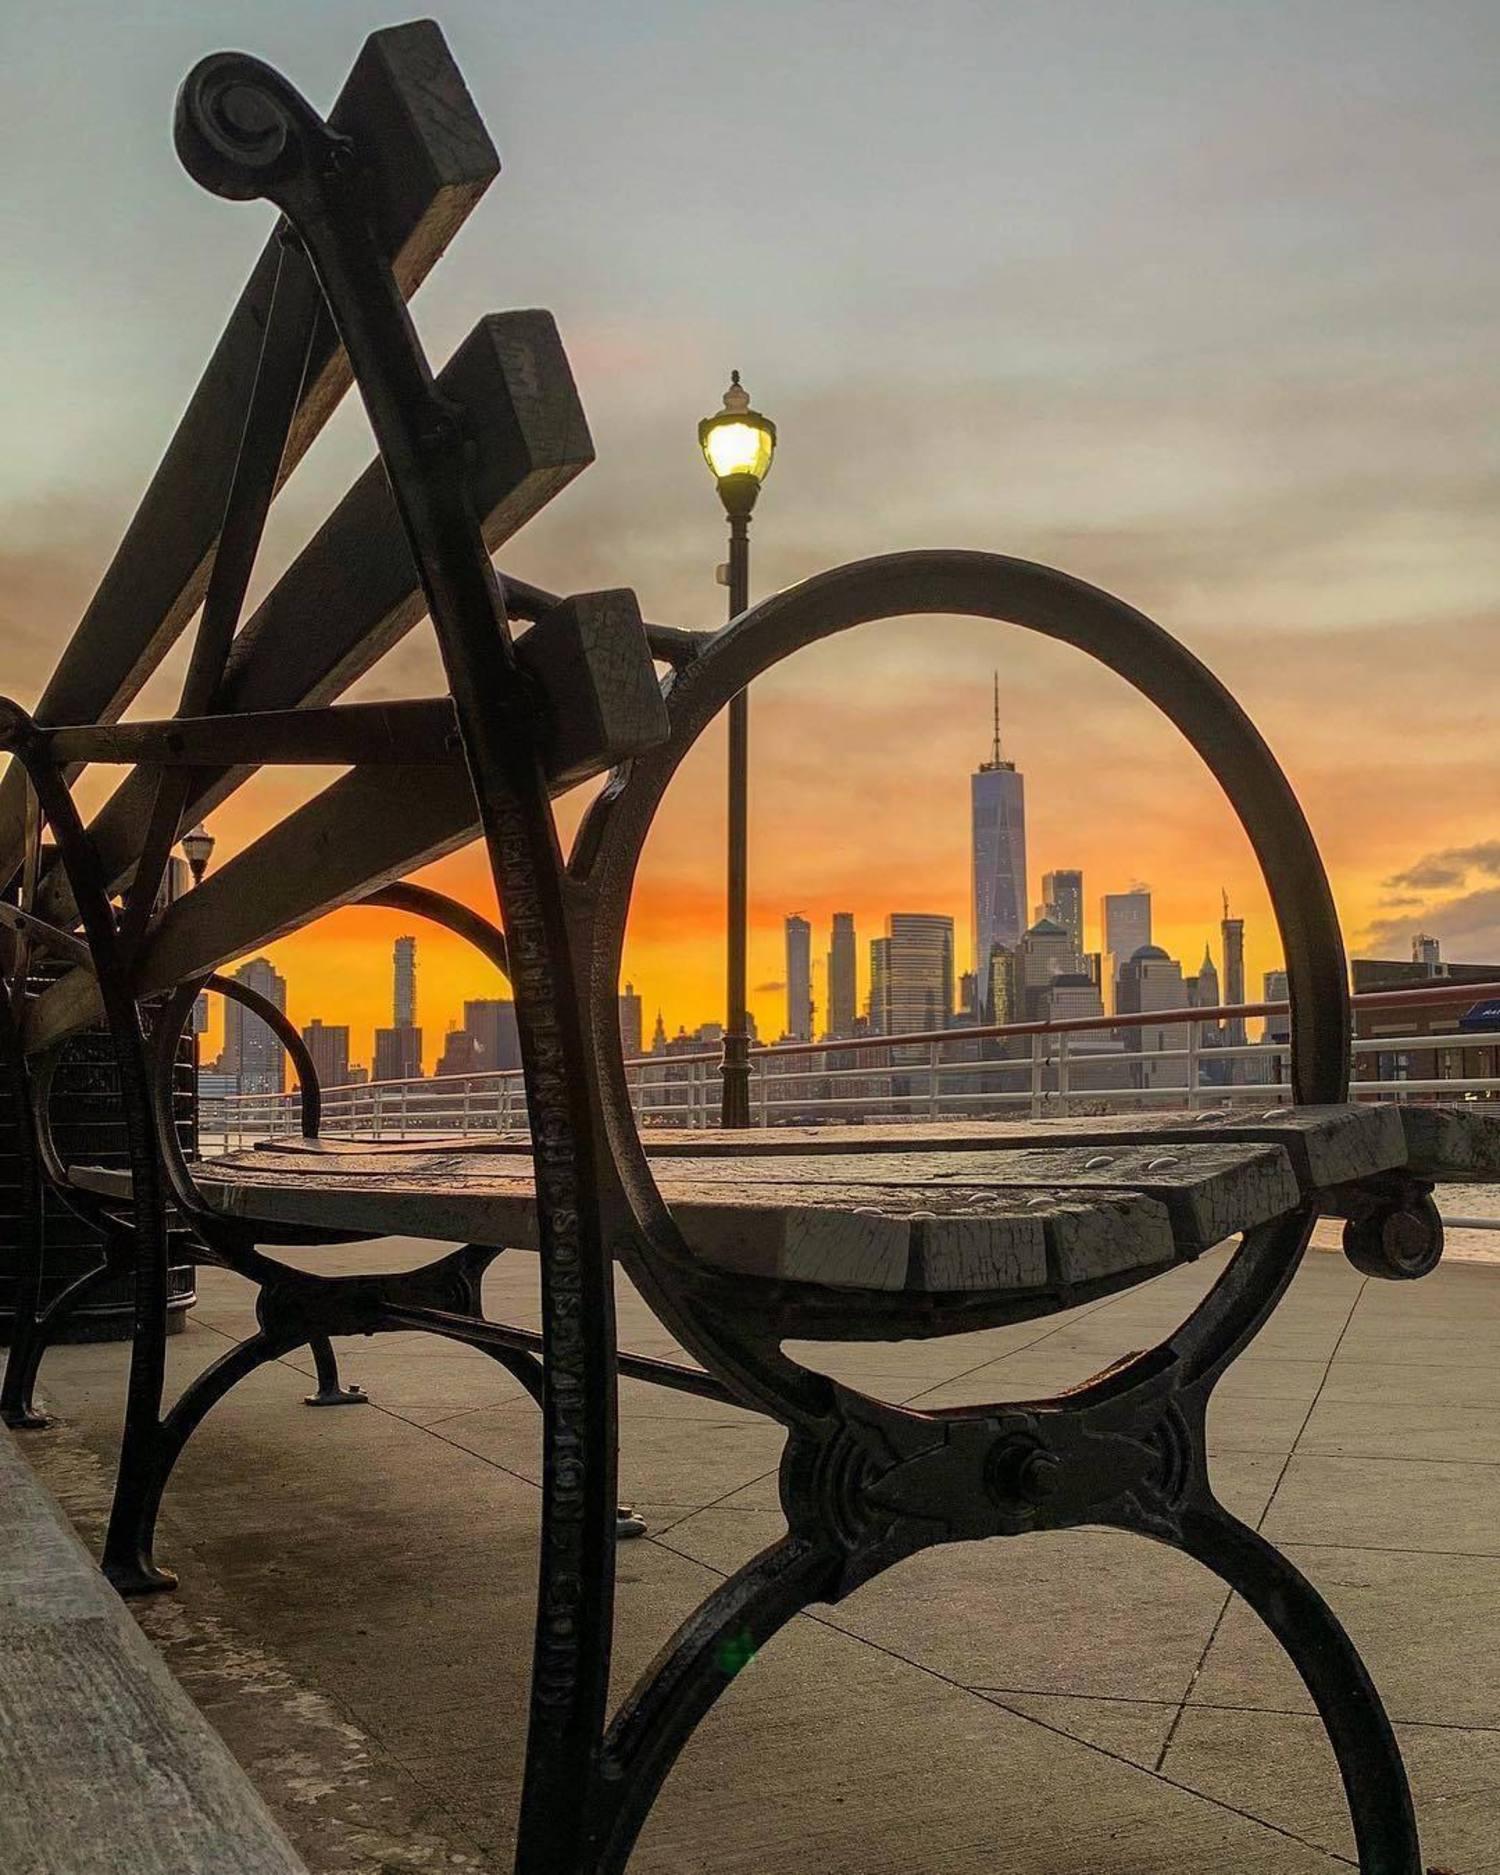 Sunrise over New York. Photo via @nyclovesnyc #viewingnyc #nyc #newyork #newyorkcity #sunrise